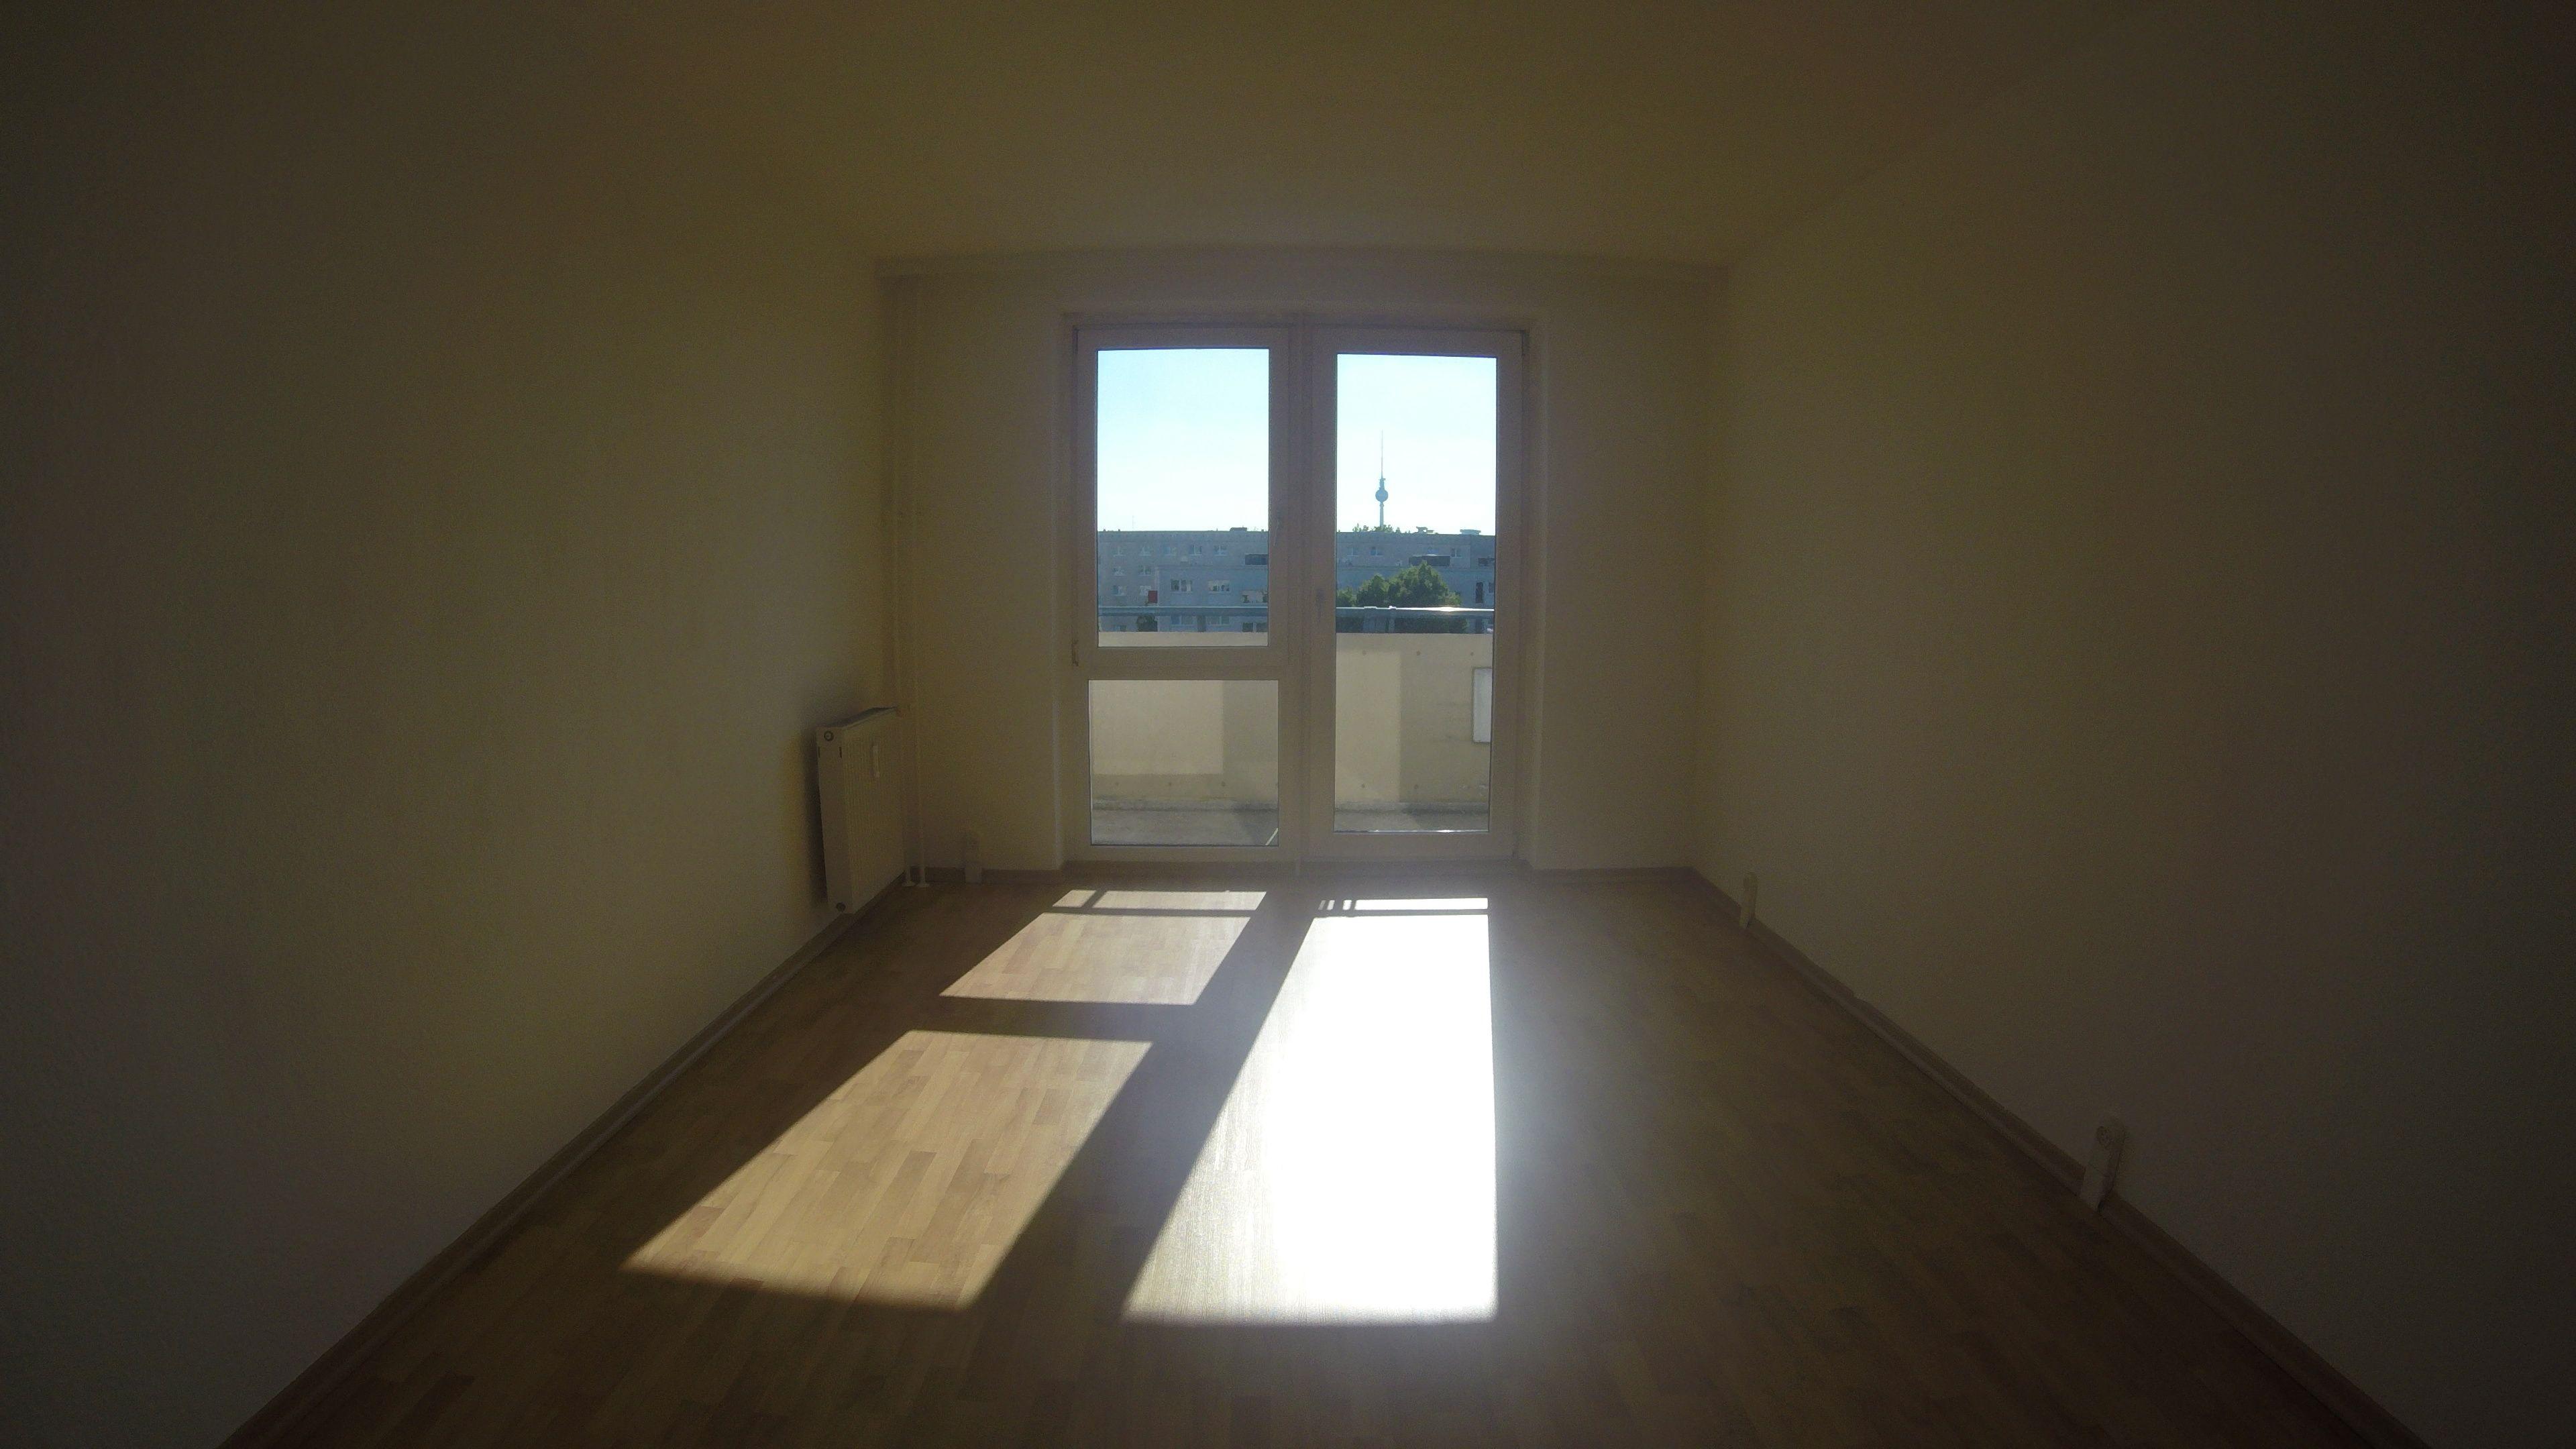 P5 7M 2 Zimmer Mietwohnung In Berlin